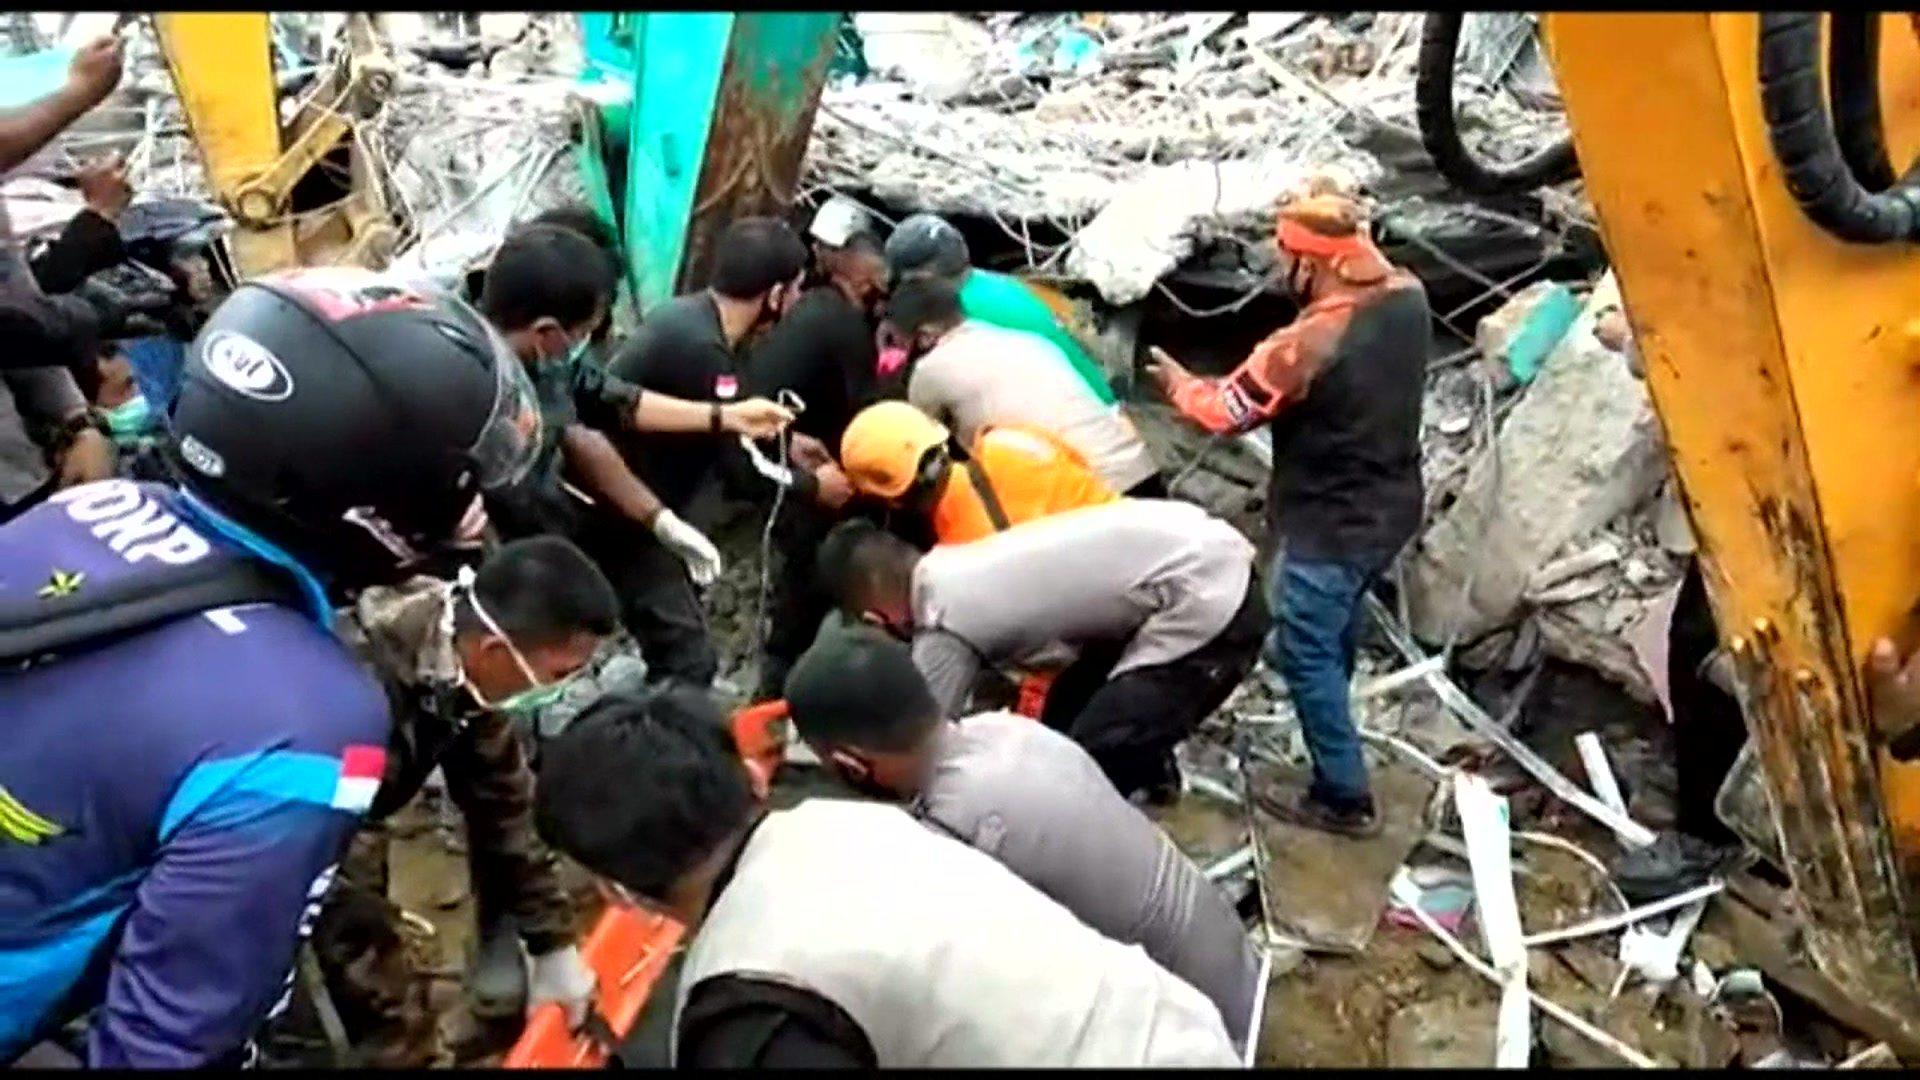 Indonesia earthquake: Dozens dead as search for survivors continues (2021)